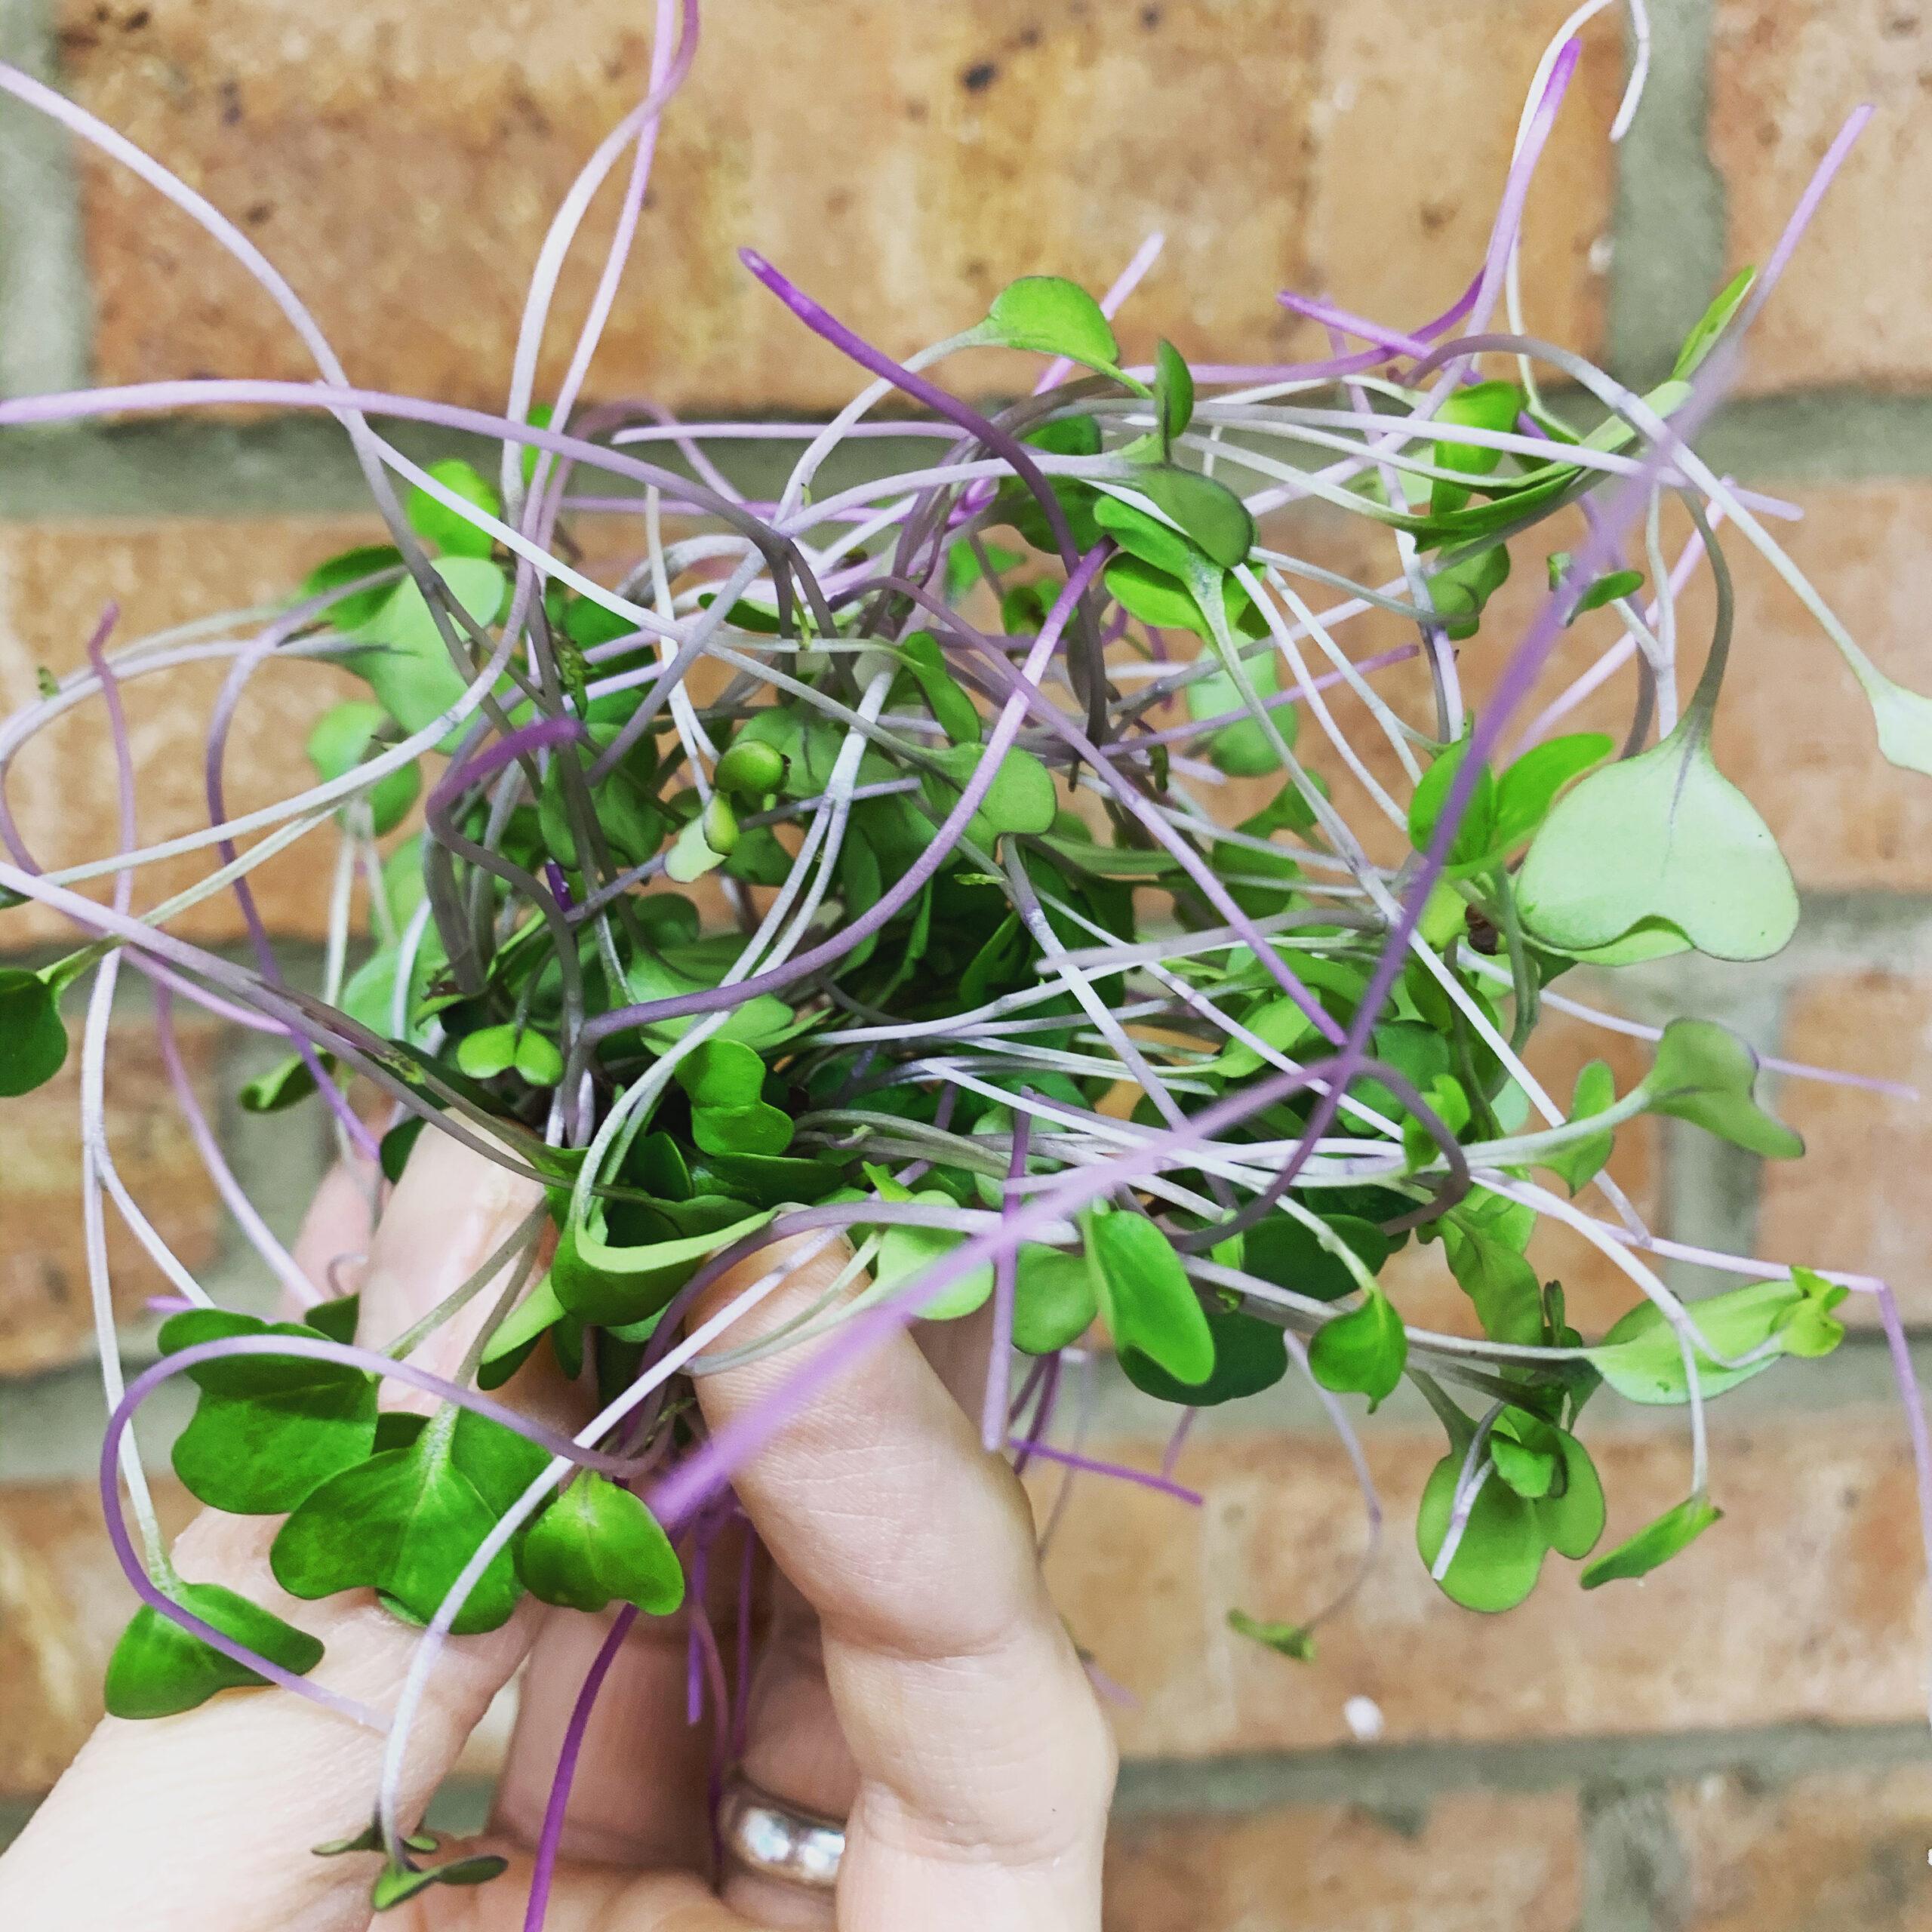 Lightfoot's Farm Microgreens indoor growing